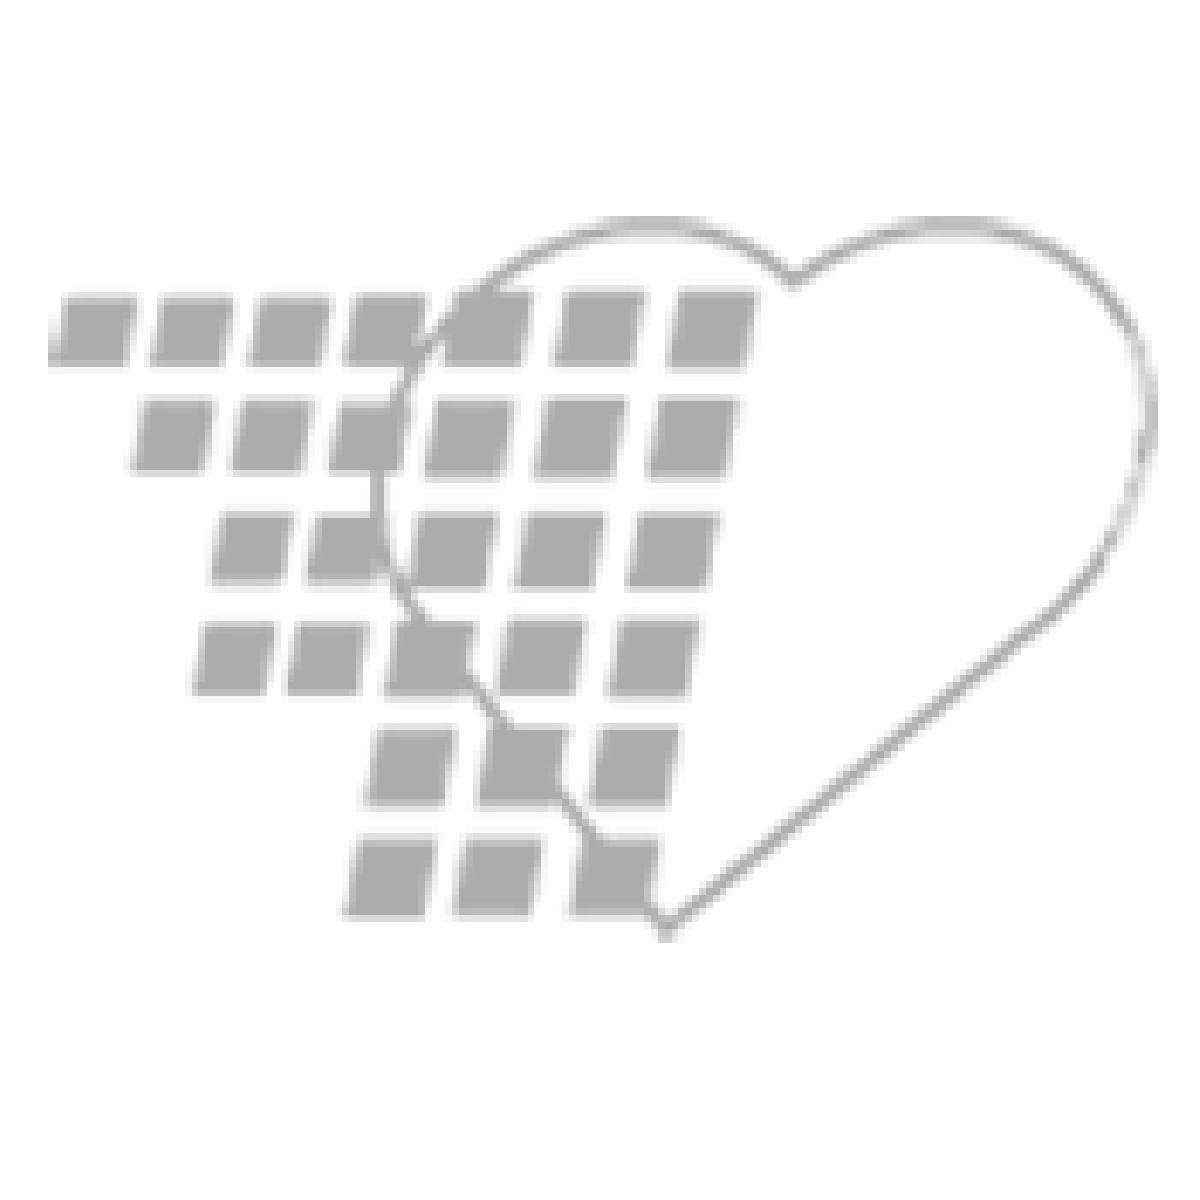 03-04-1320 PURELL™ LTX-7™ Dispenser Touch-Free Dispenser for PURELL™ Hand Sanitizer